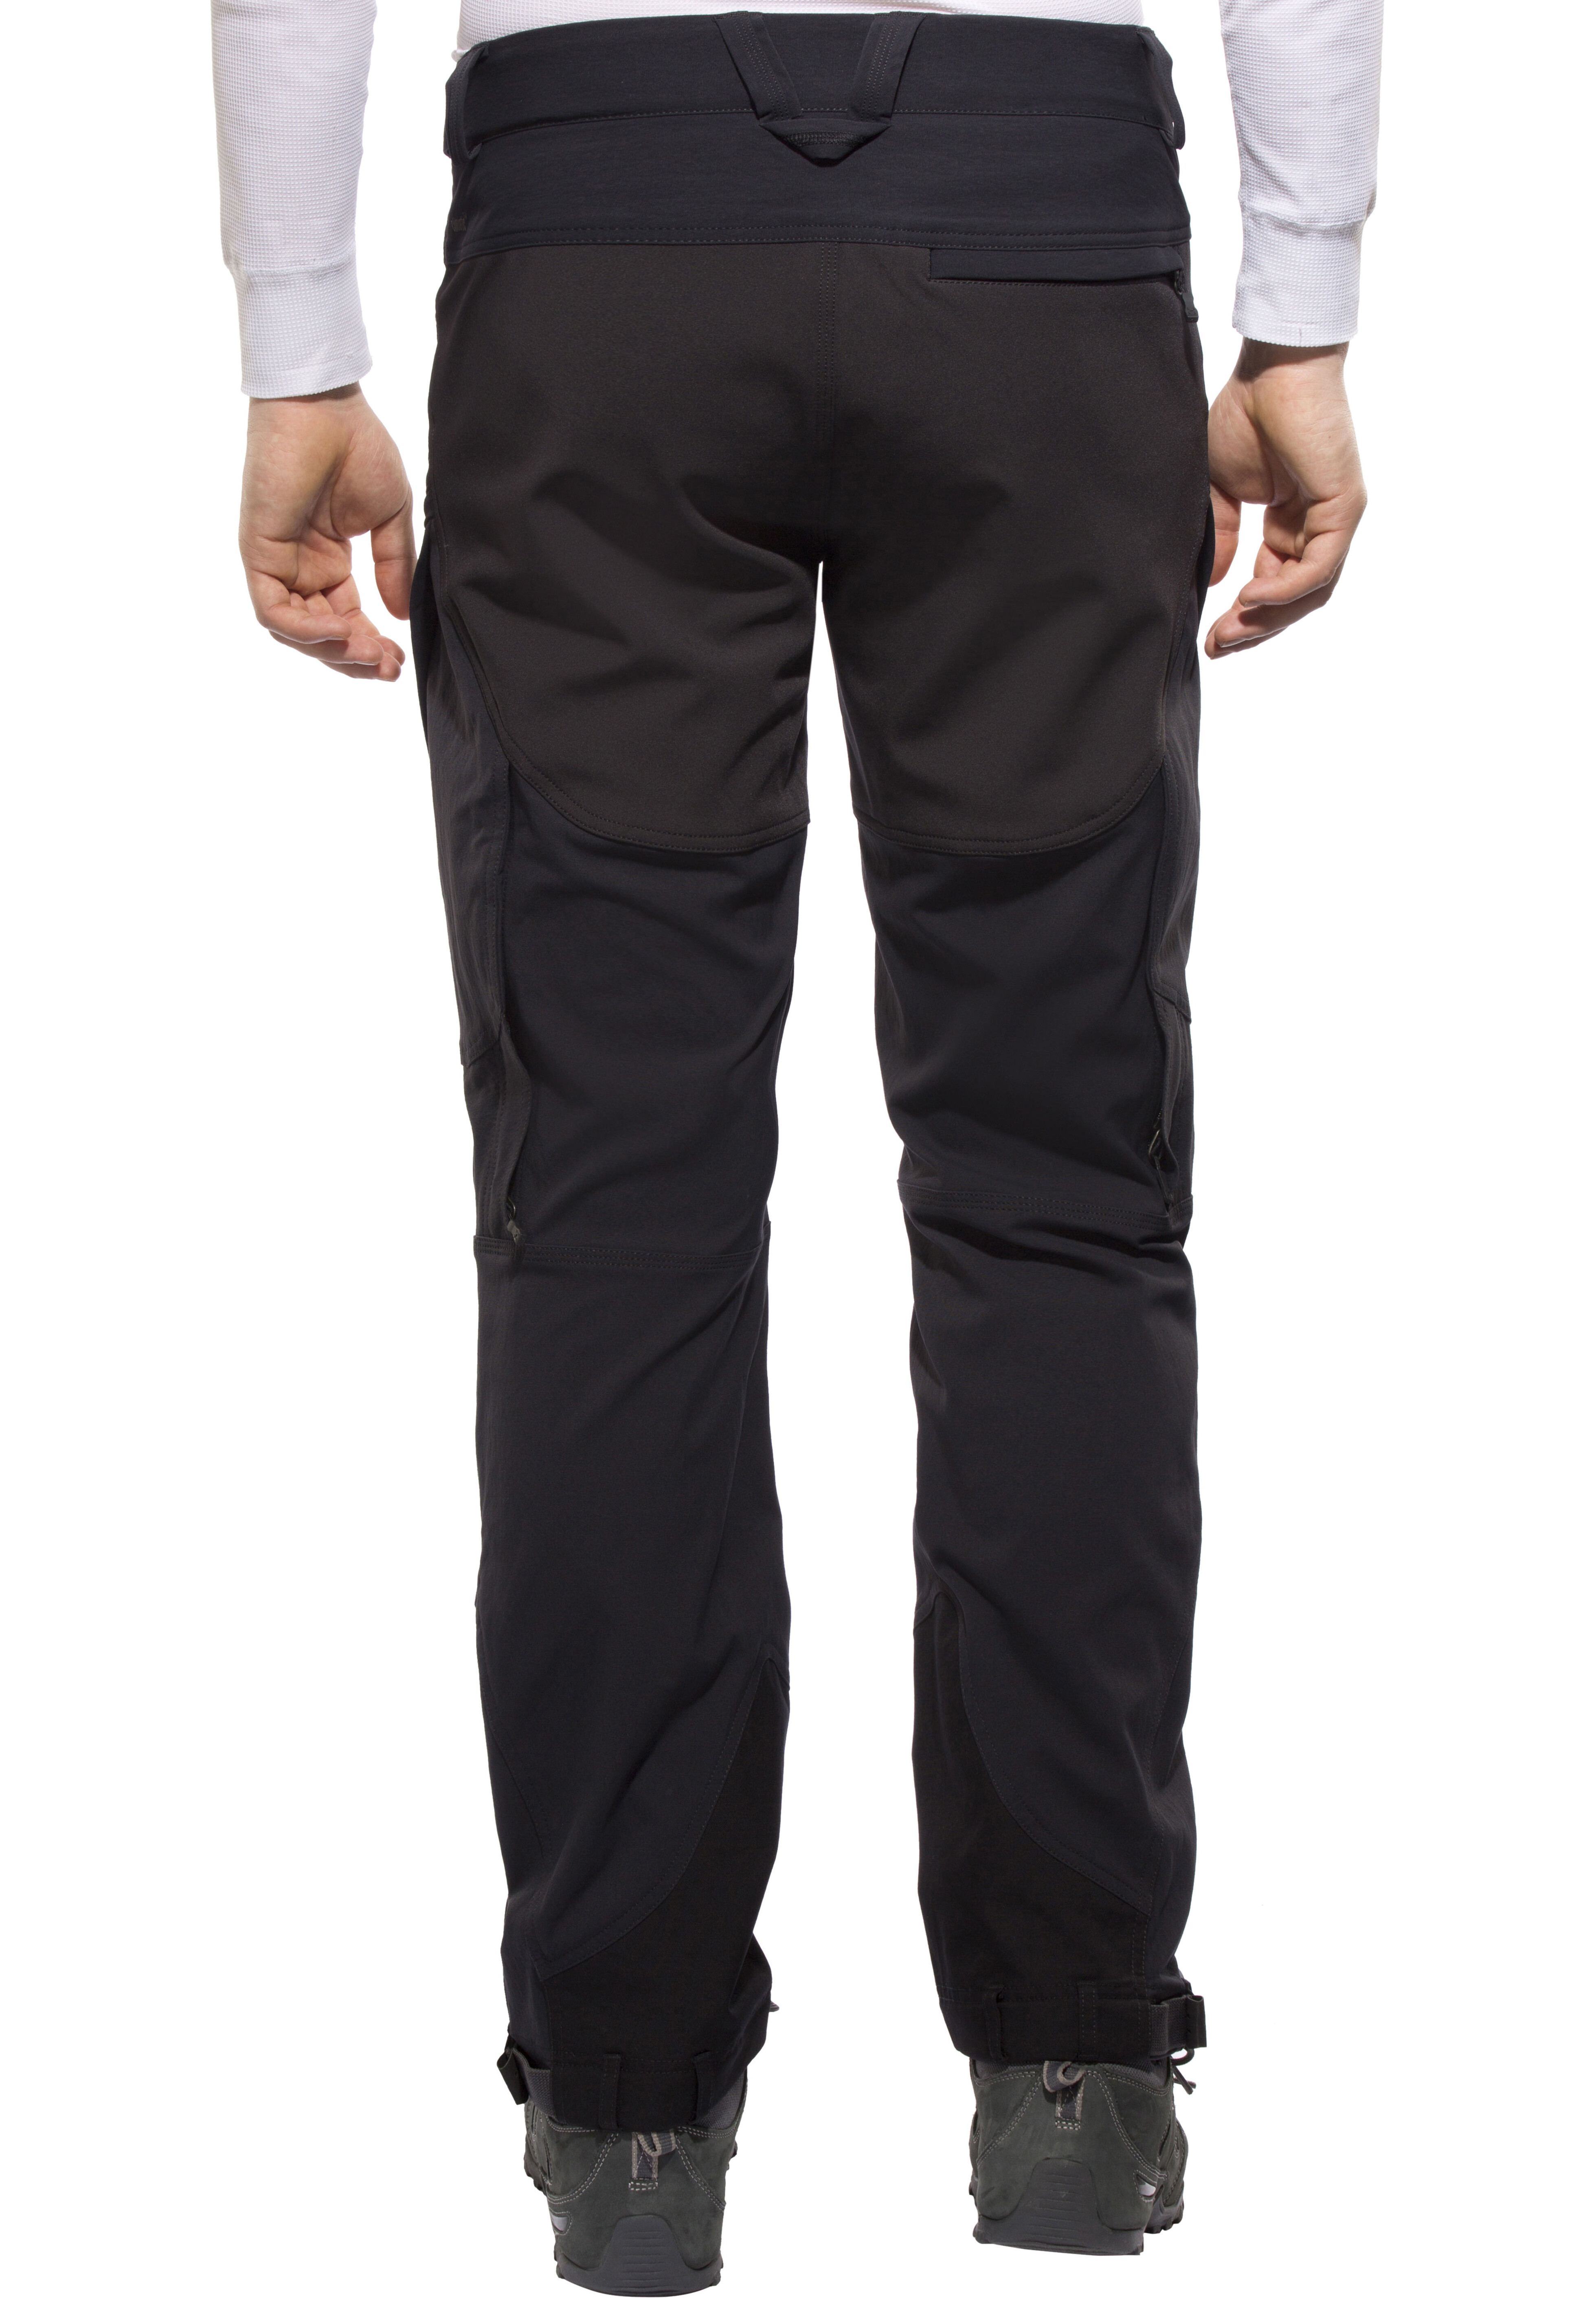 Haglöfs Rugged II Mountain Pants Men black